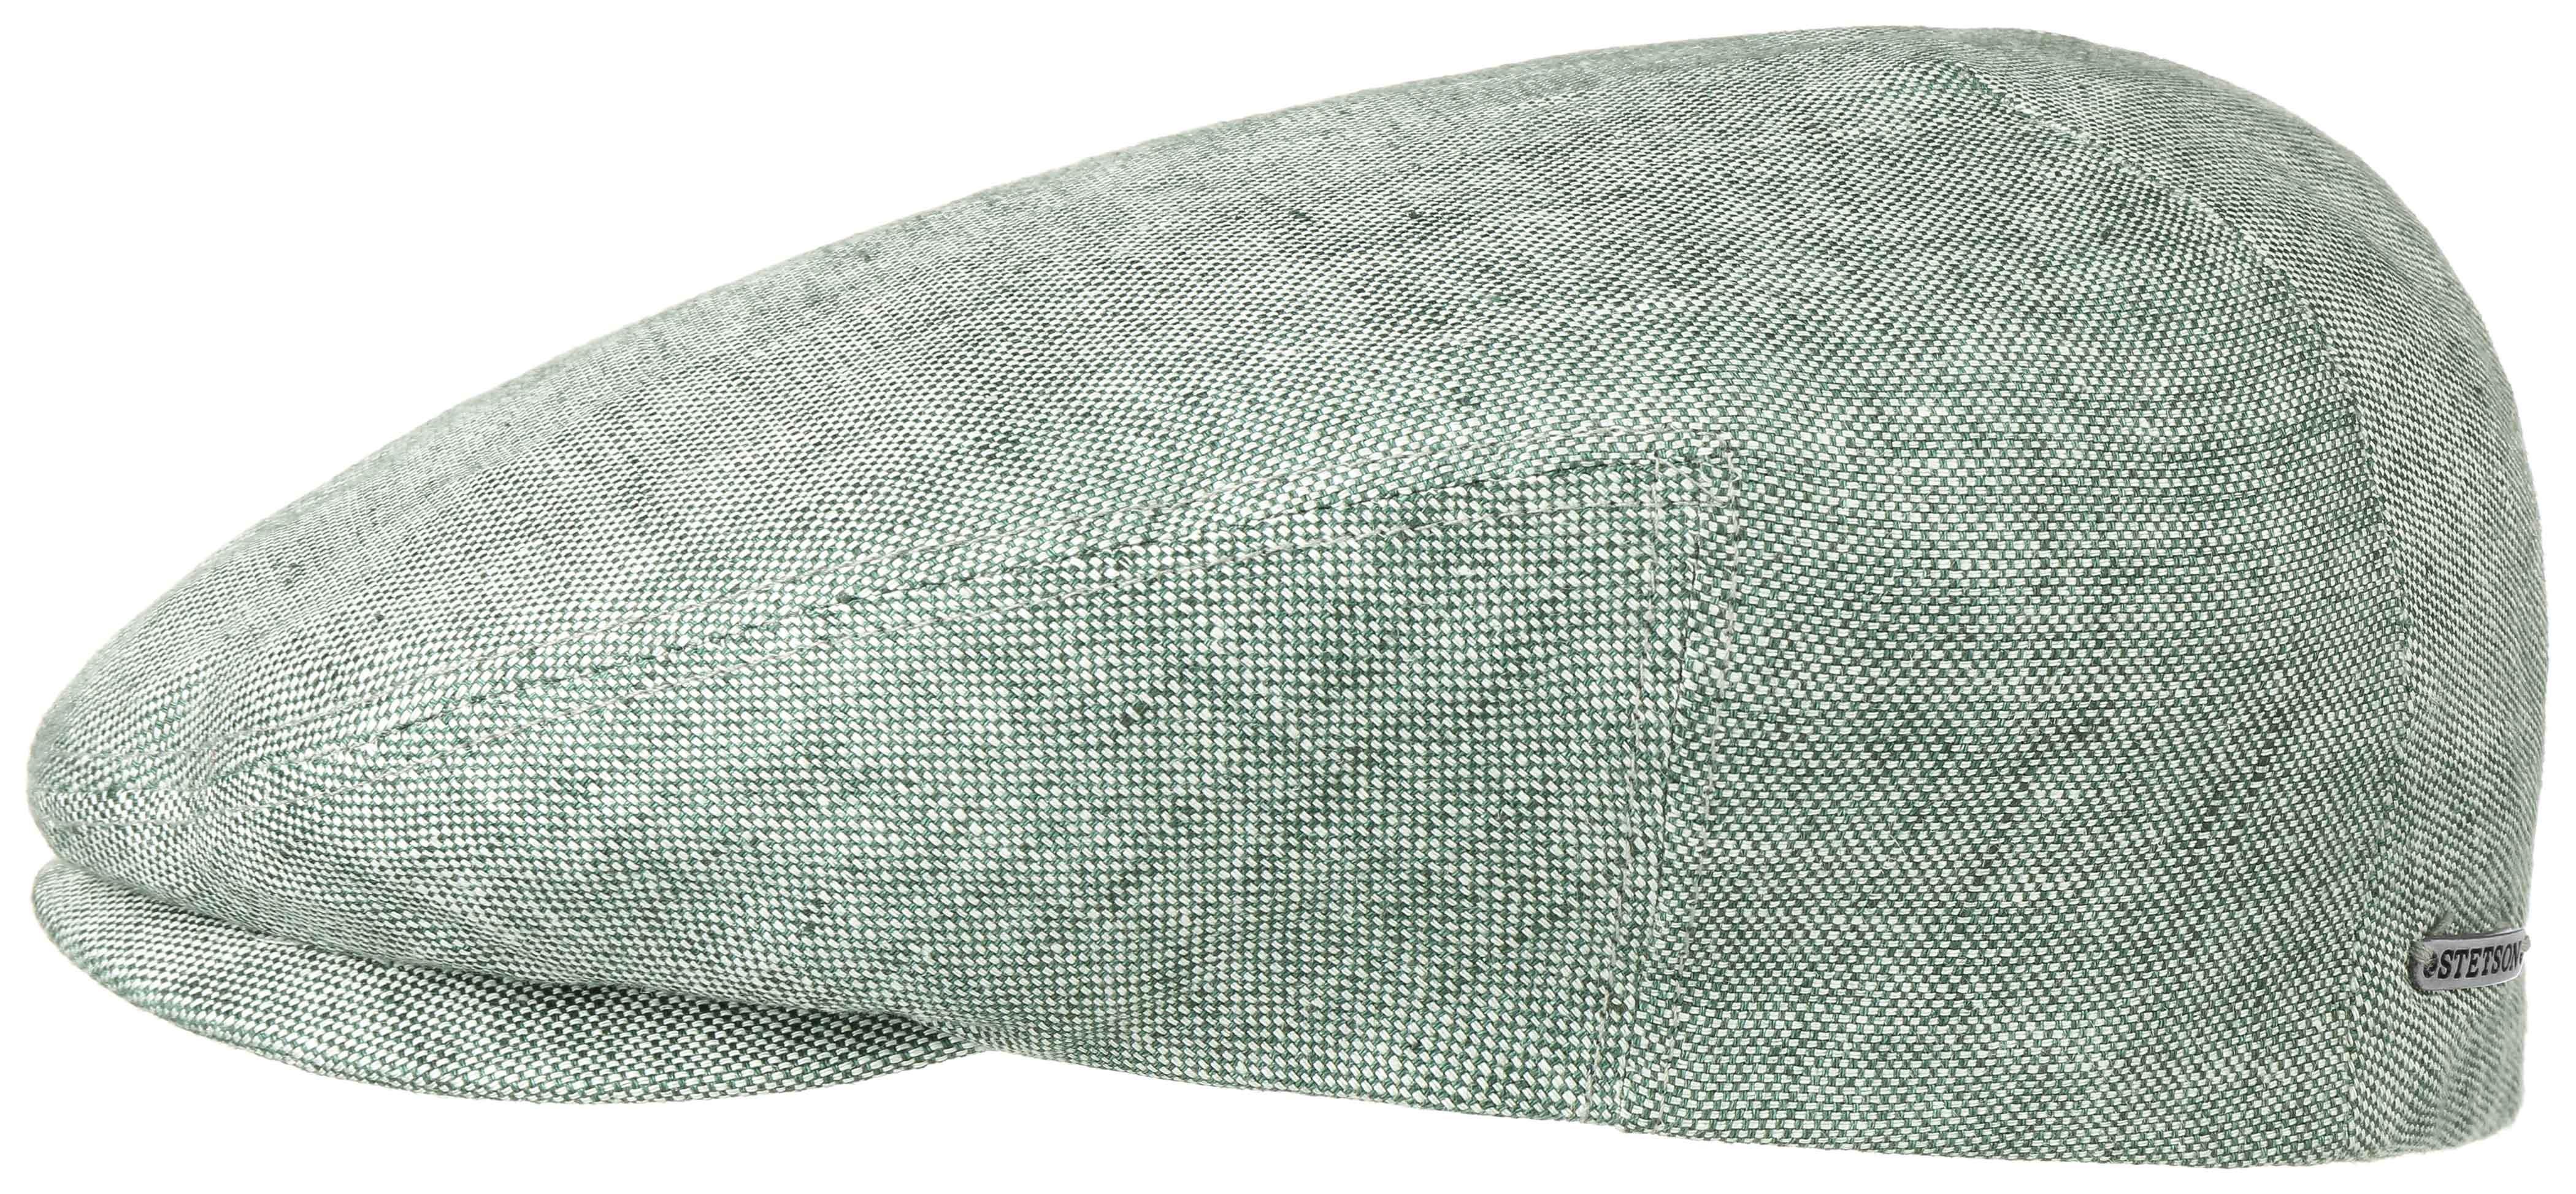 Stetson Driver Cap Linen Yeşil Gri Şapka